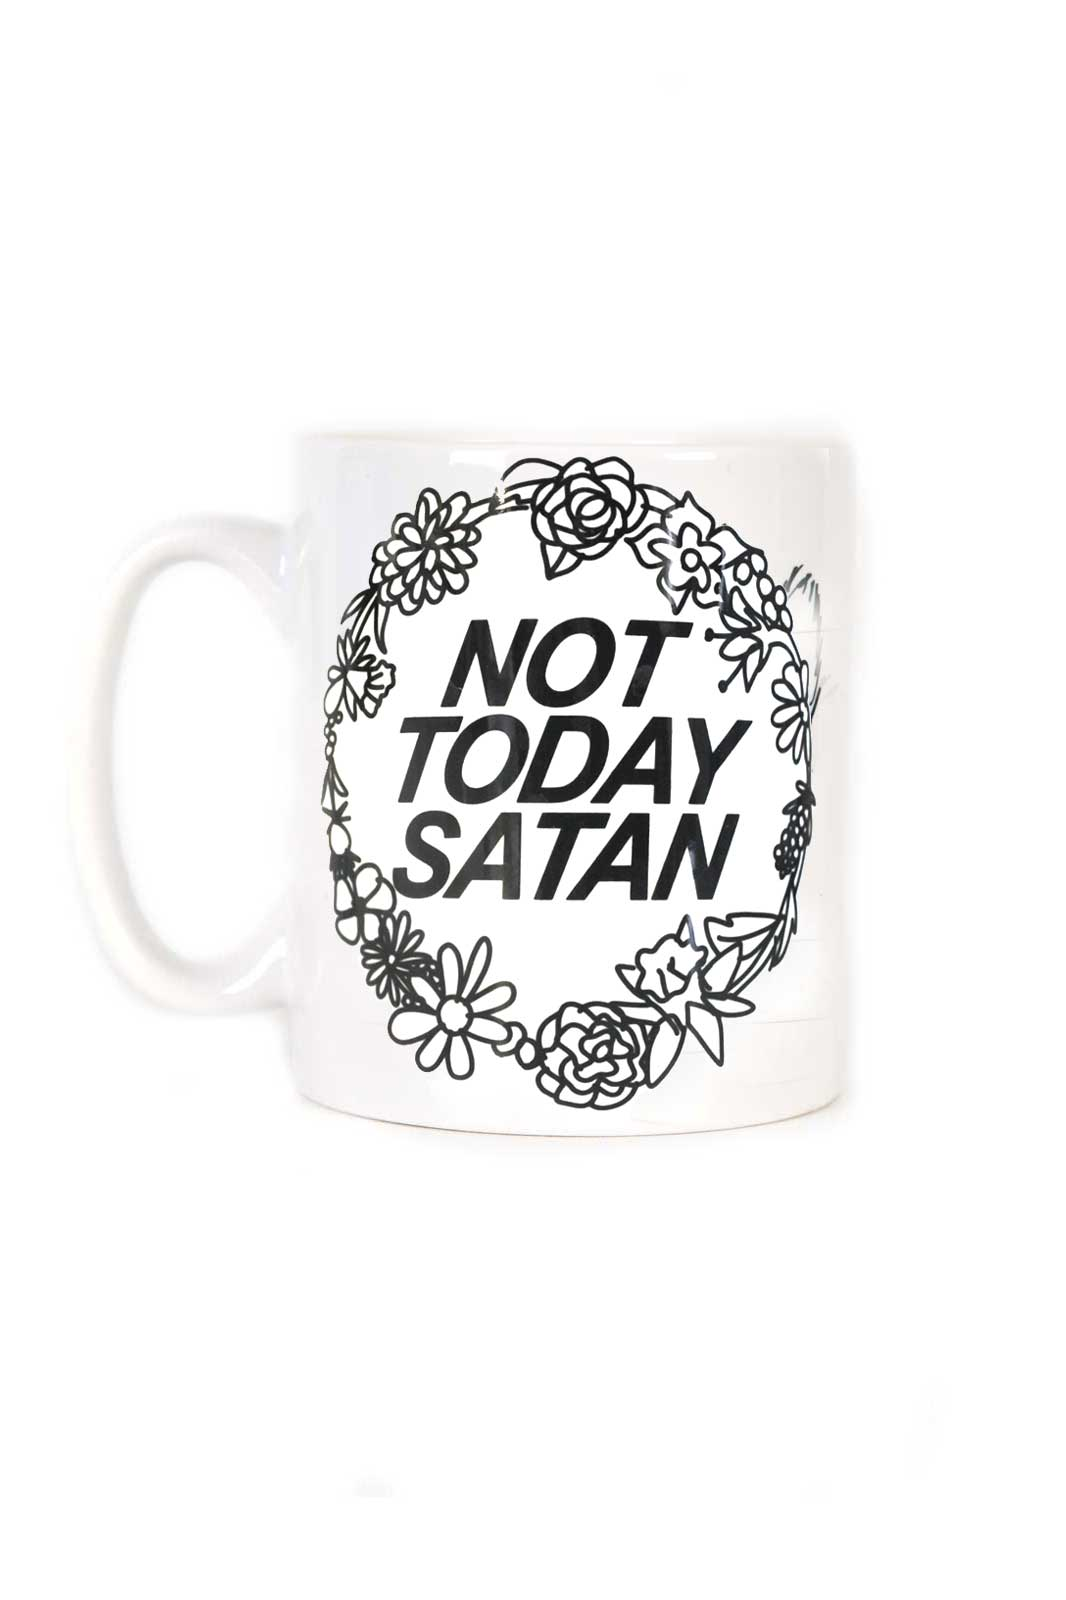 extreme largeness not today satan mug